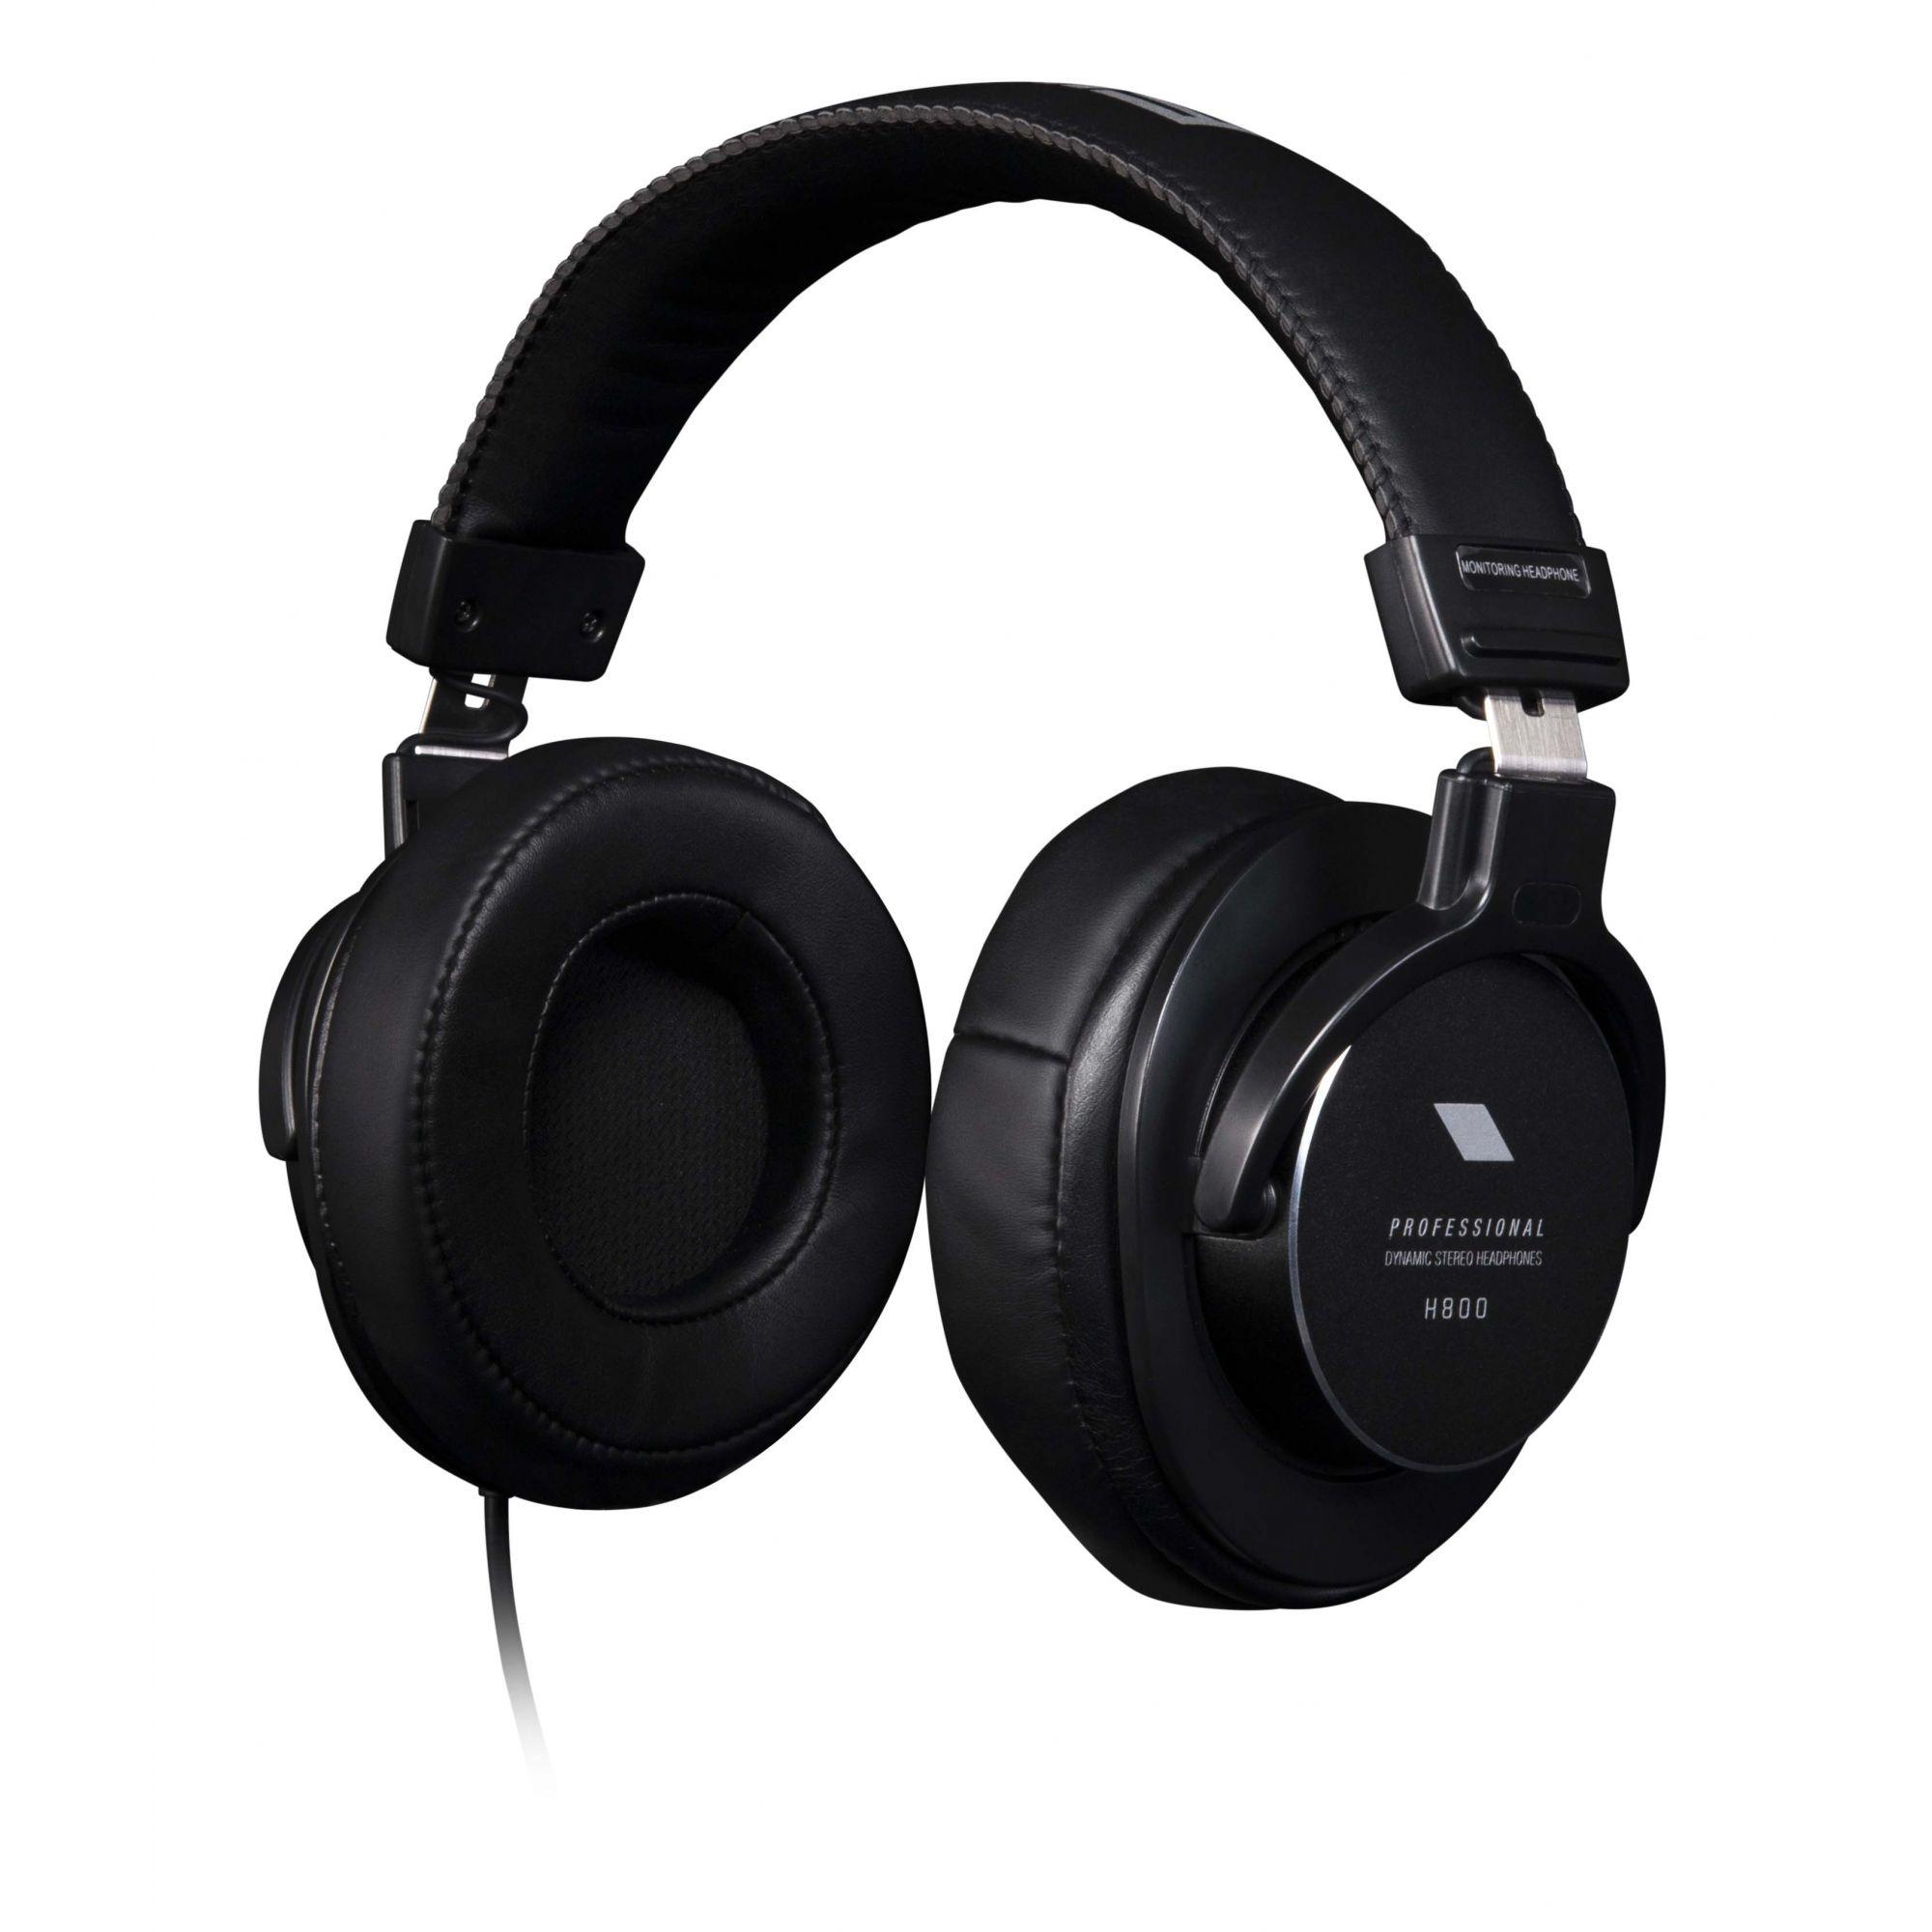 Fone de Ouvido - Profissional - Tipo Estúdio - Design Dinâmico/Fechado - H800 - PROEL